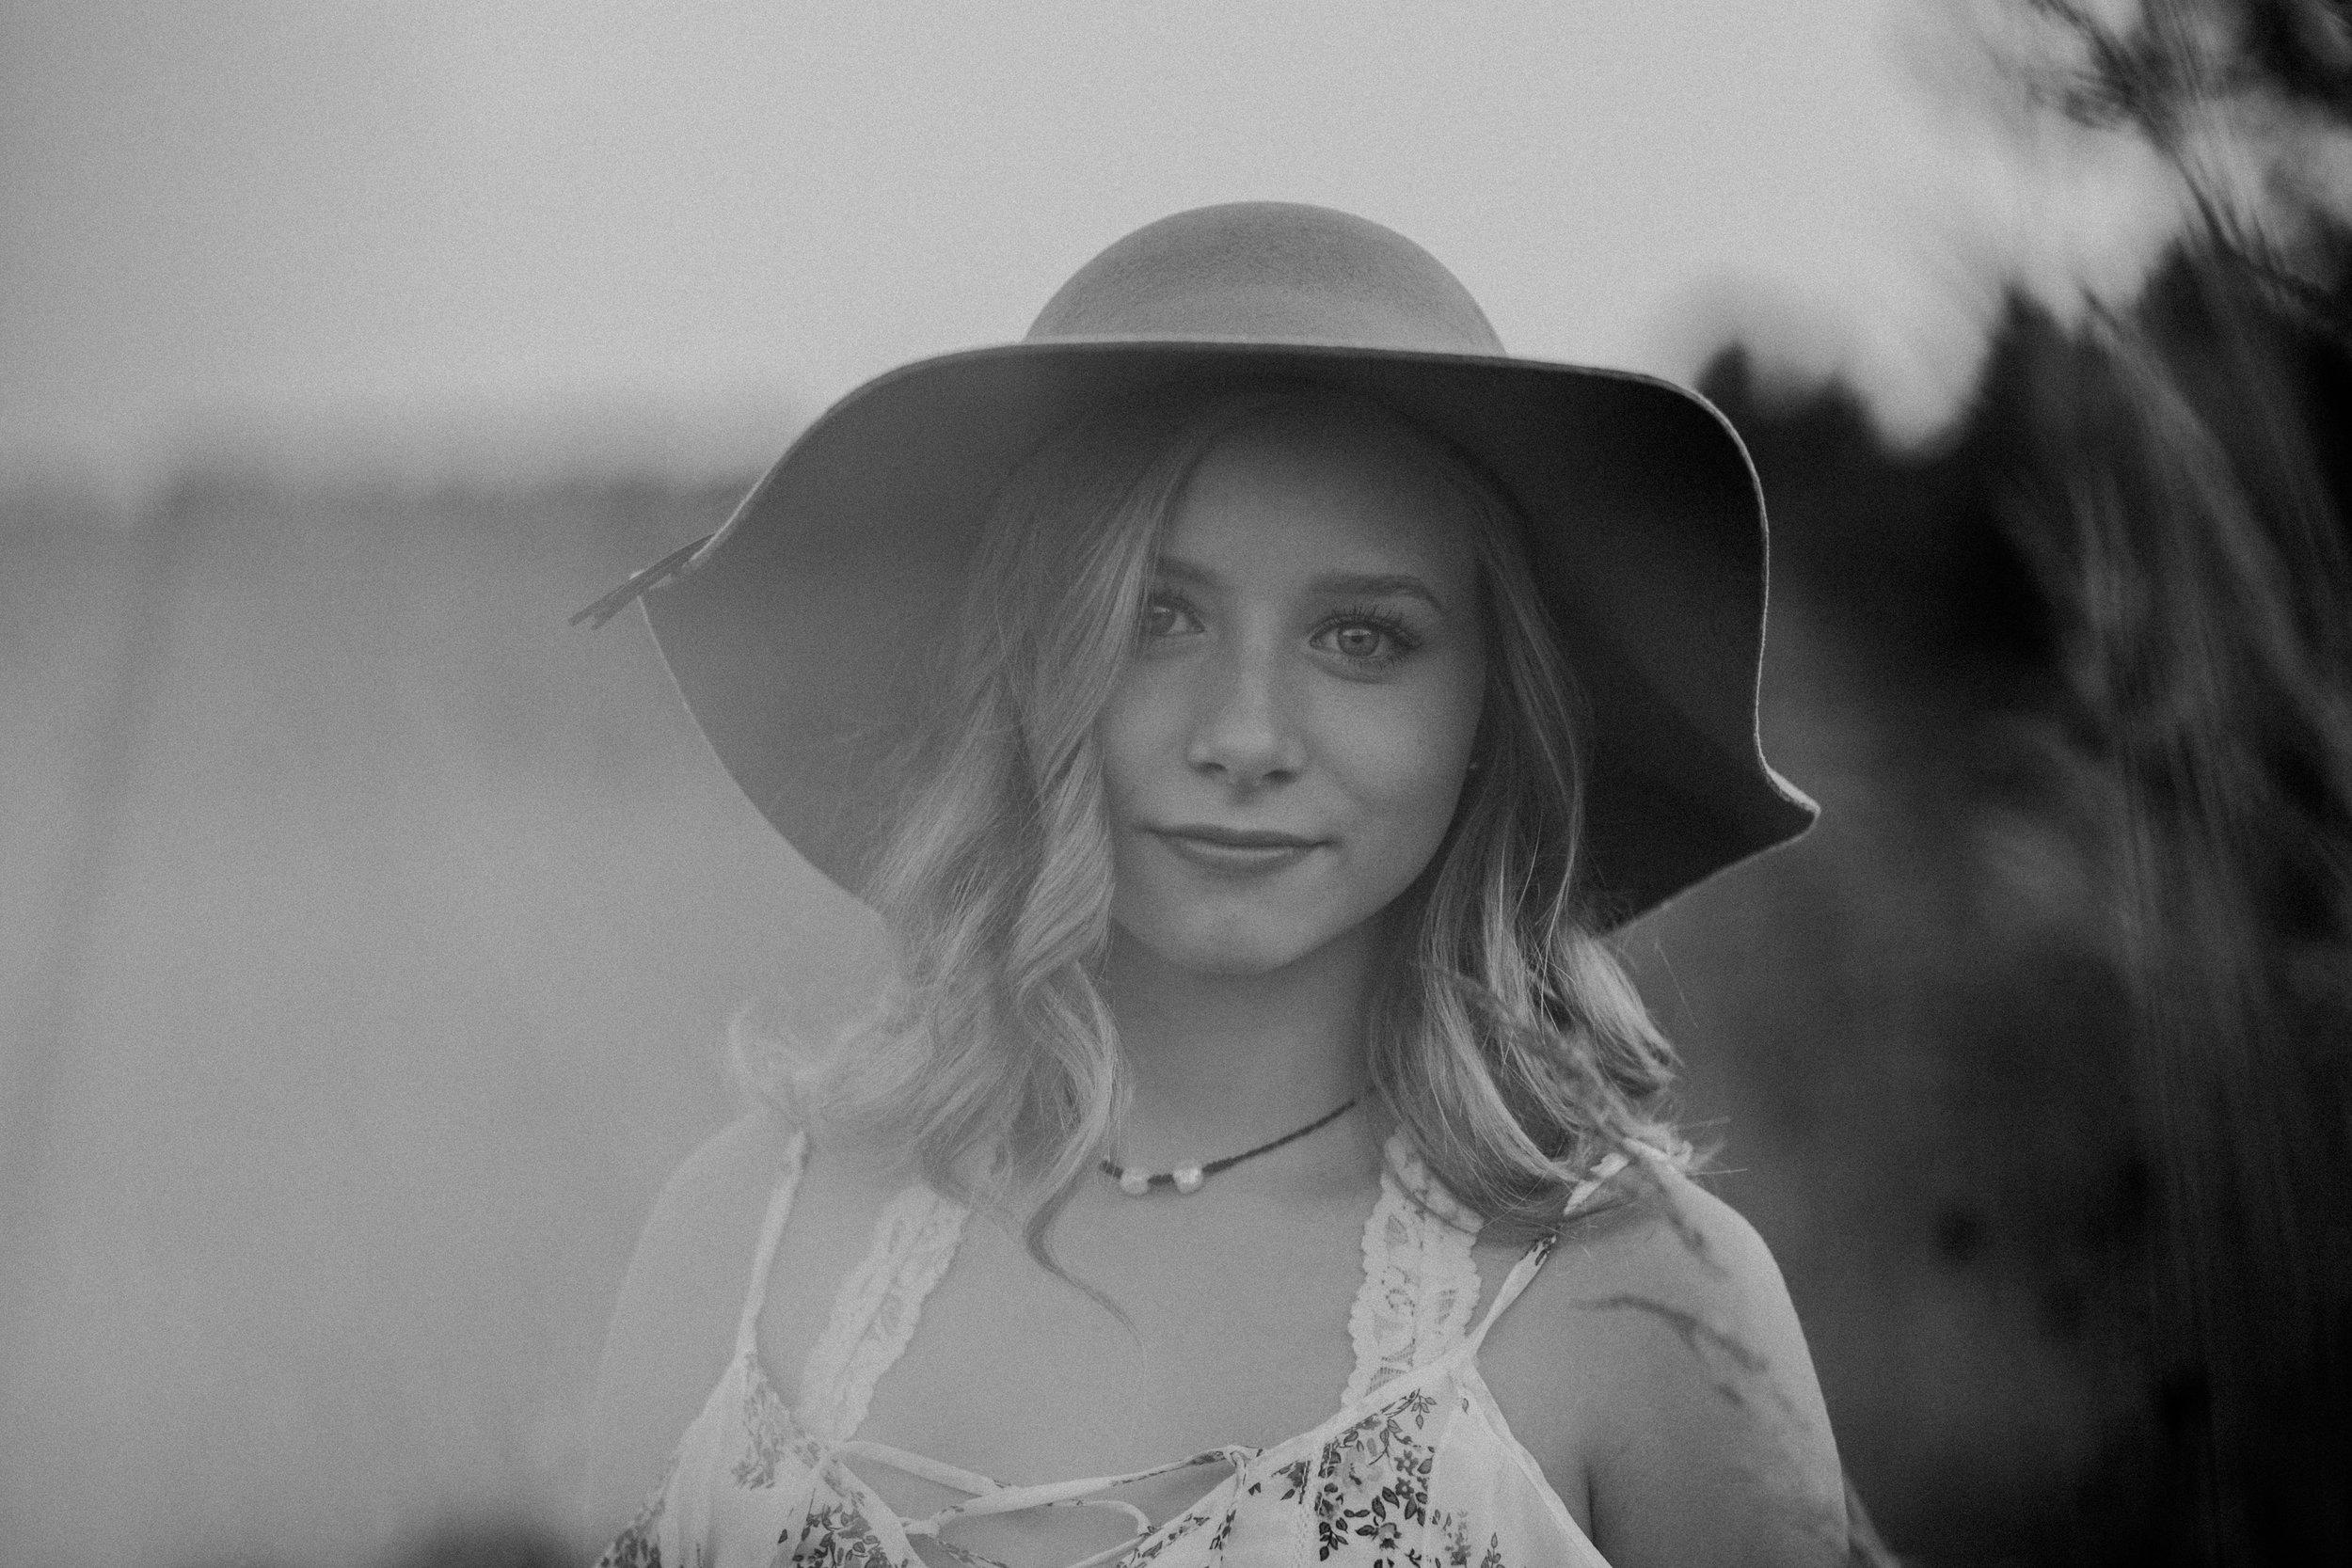 barron-wi-high-school-senior-photographer-boho